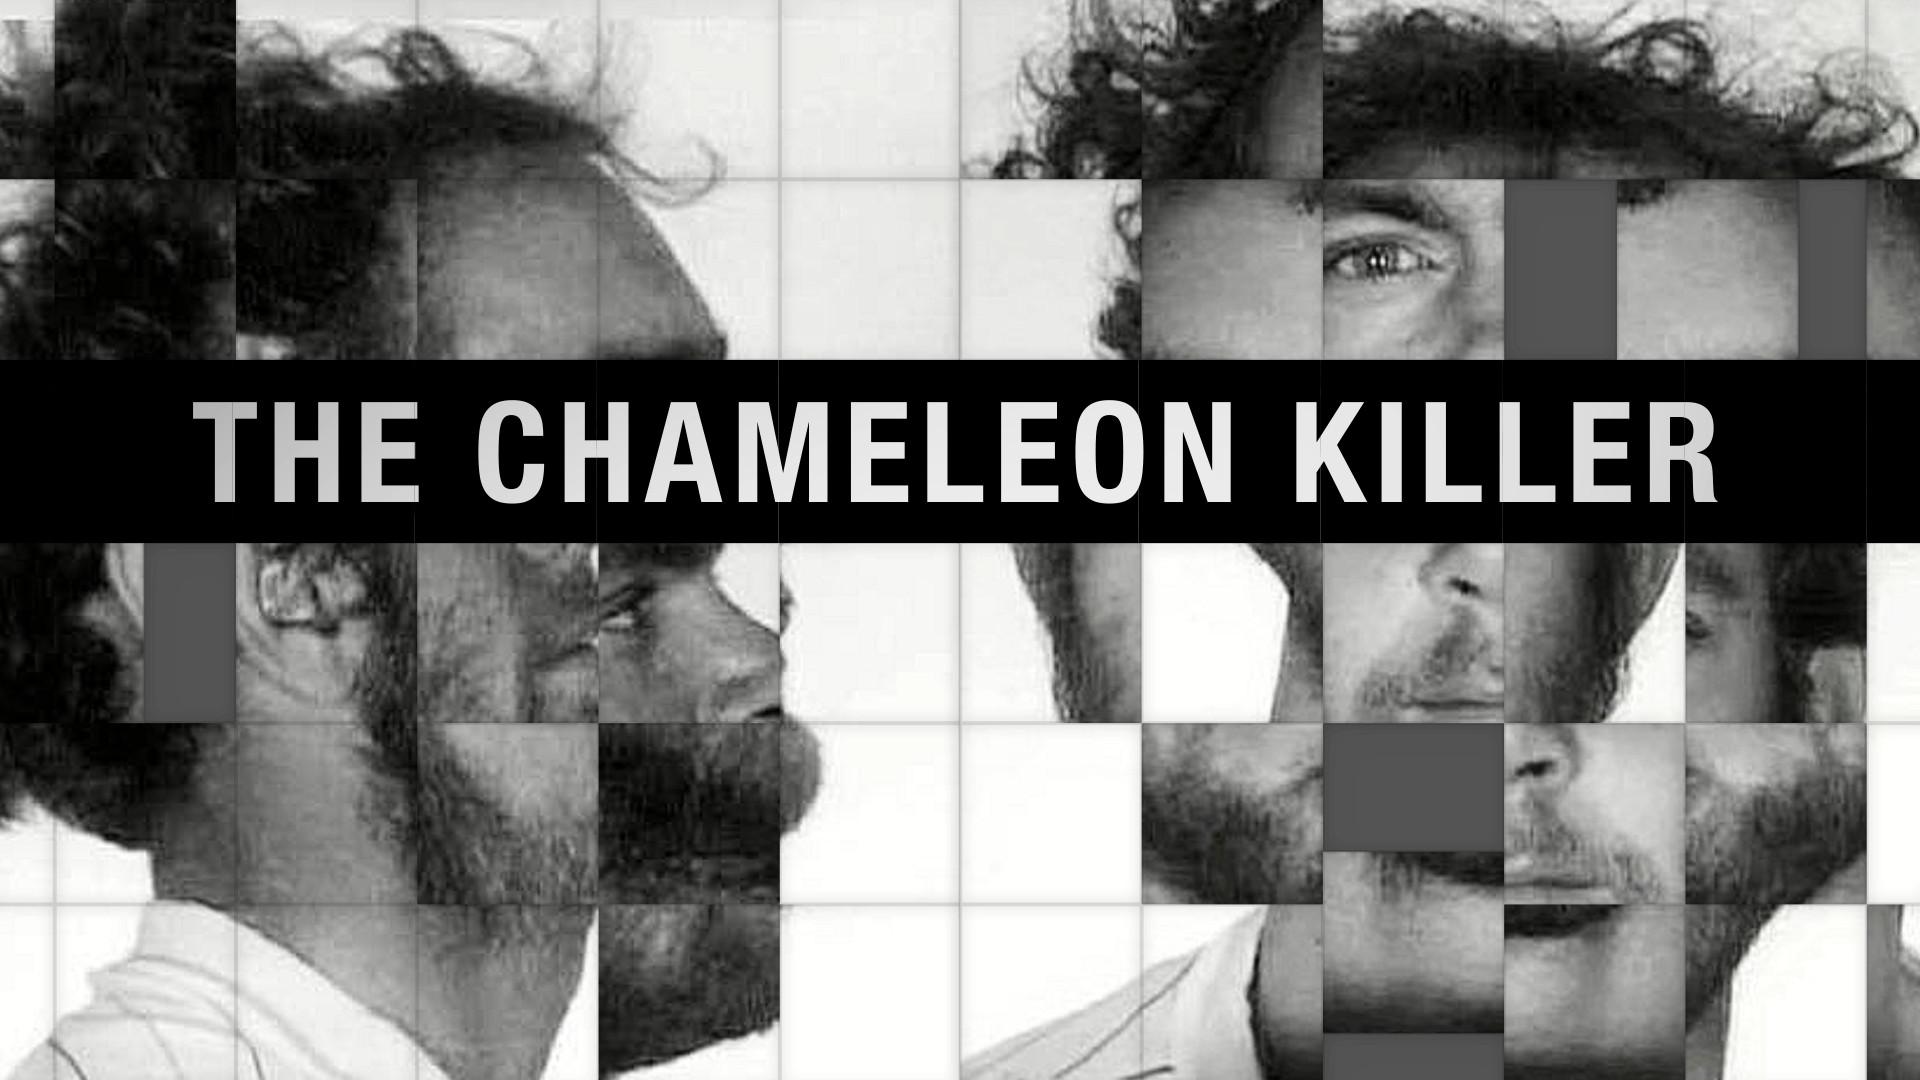 Chameleon Killer Discovery Channel